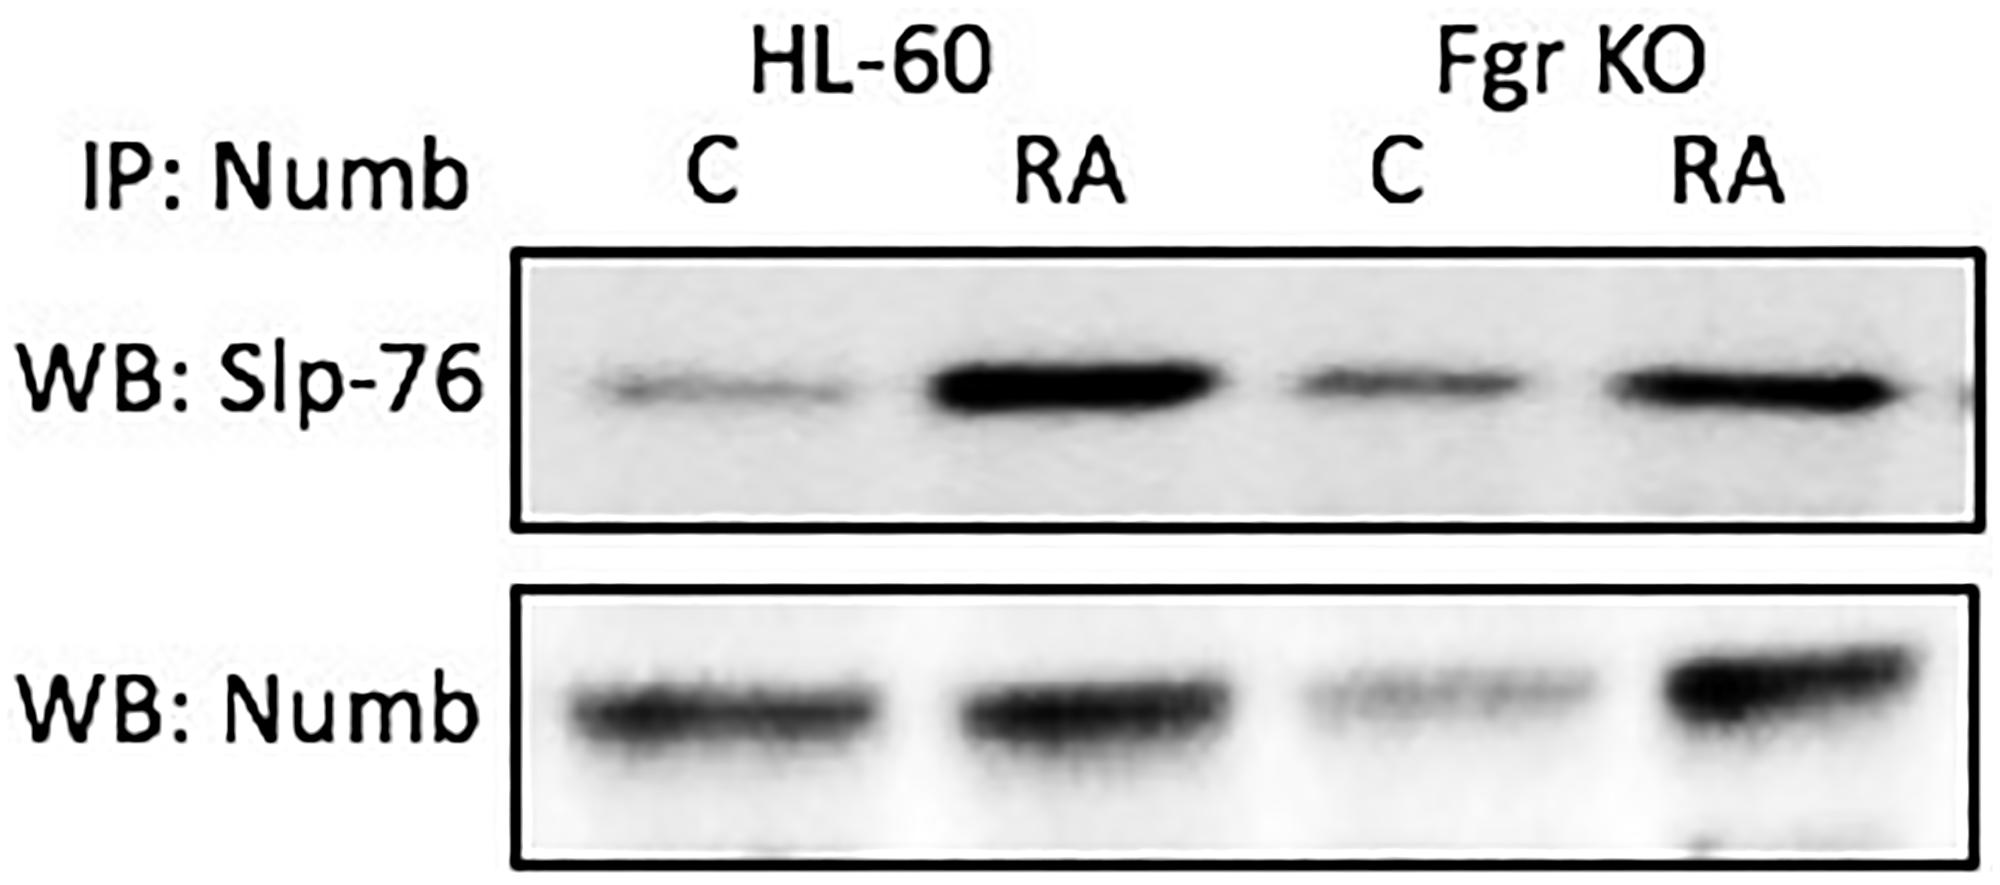 Numb binding Slp-76 in HL-60 wt and Fgr KO cells assayed by immunoprecipitation.